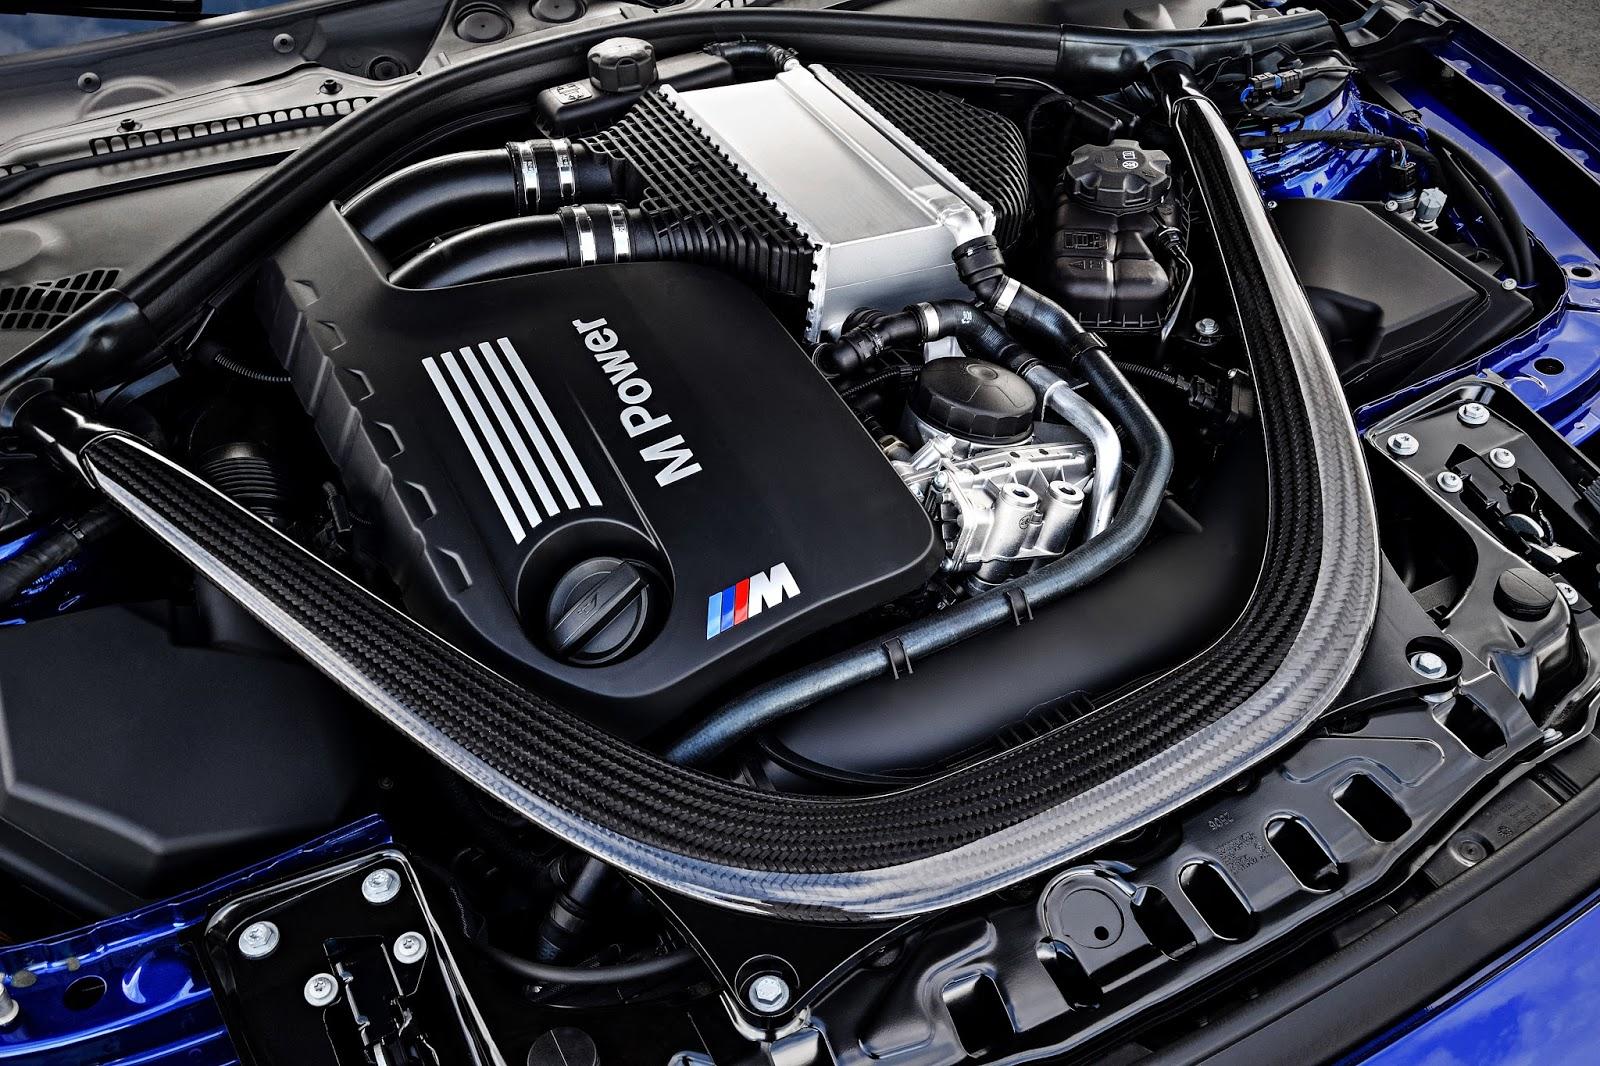 P90251067 highRes the new bmw m4 cs 04 Η περιορισμένης παραγωγής BMW M4 ClubSport δική σας με 116.900 ευρώ BMW, BMW M, BMW M4, BMW M4 CS, BMW Motorsport, clubsport, COUPE, Limited edition, supercars, supersport, videos, Περιορισμένης παραγωγής